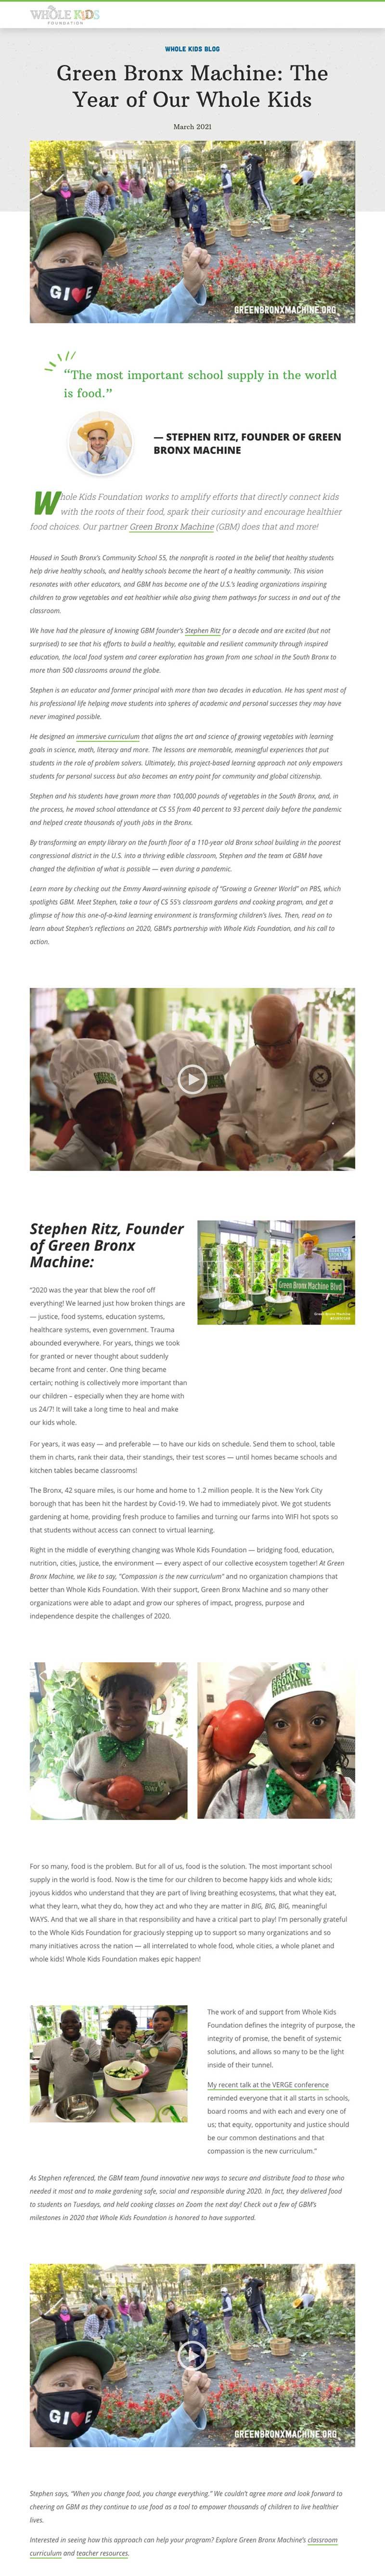 Whole Kids Foundation – Green Bronx Machine